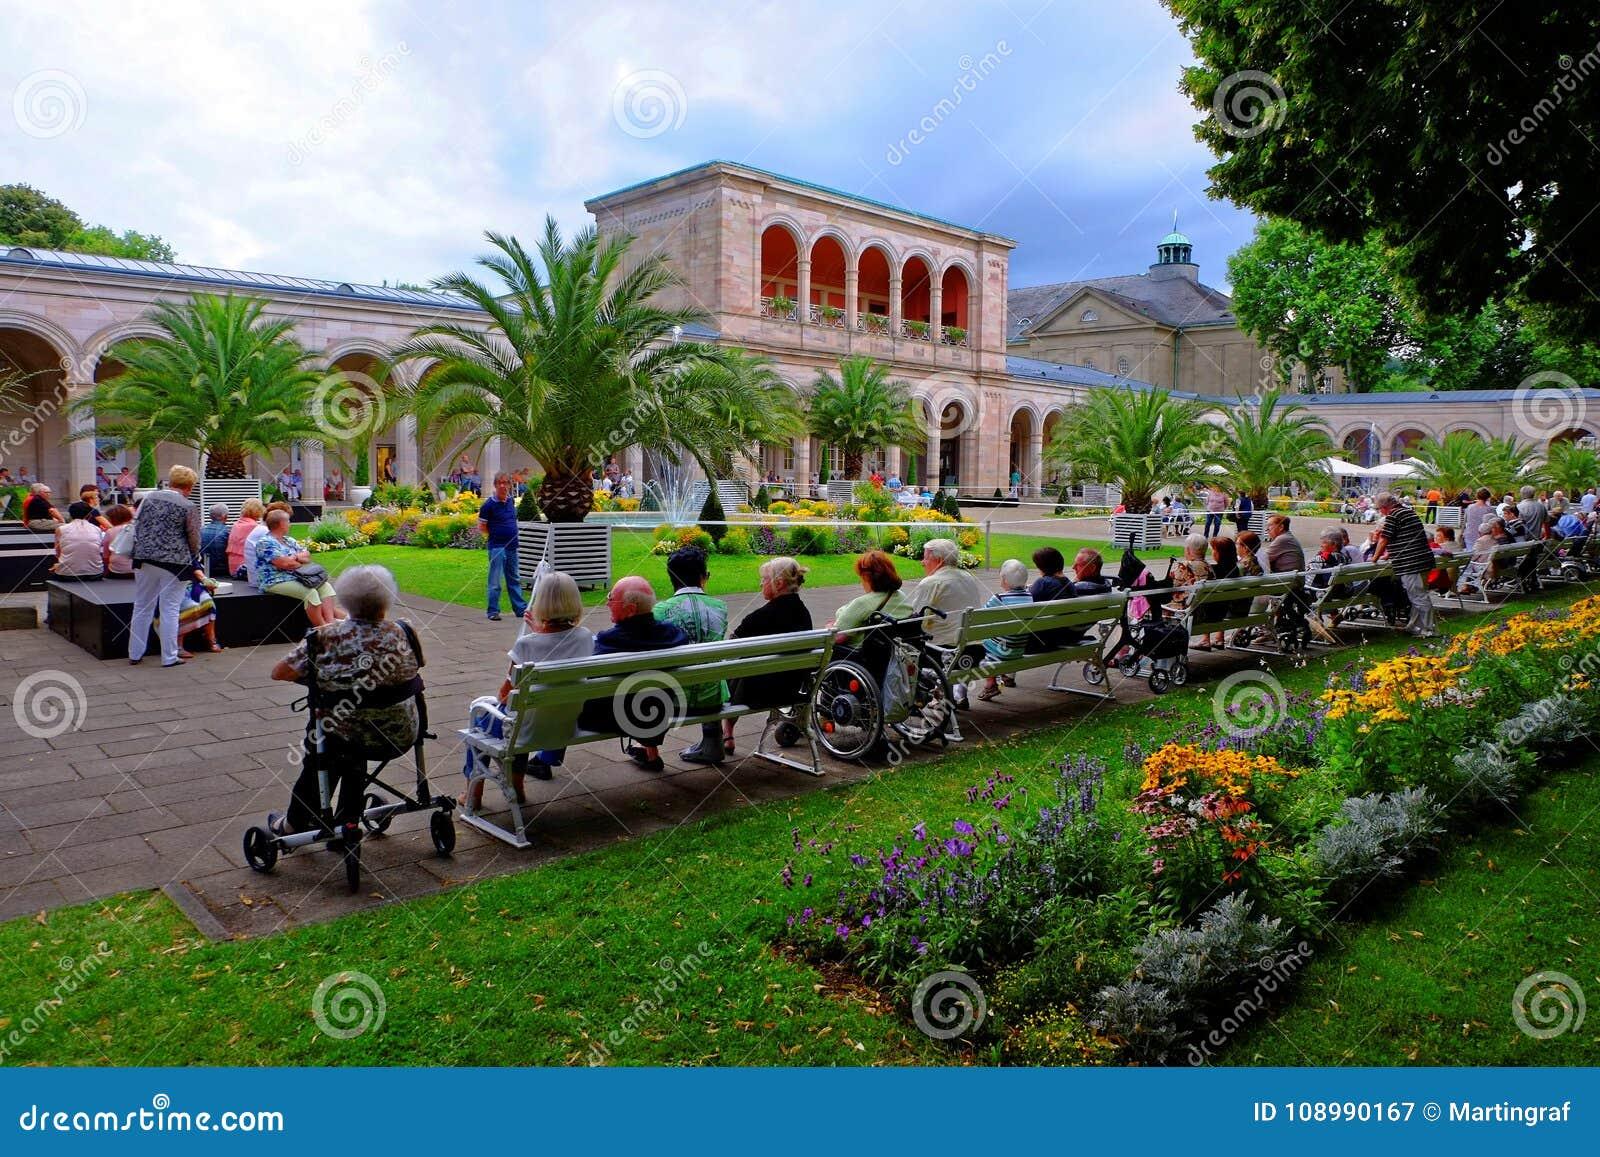 Elderly people together in park - European future generation